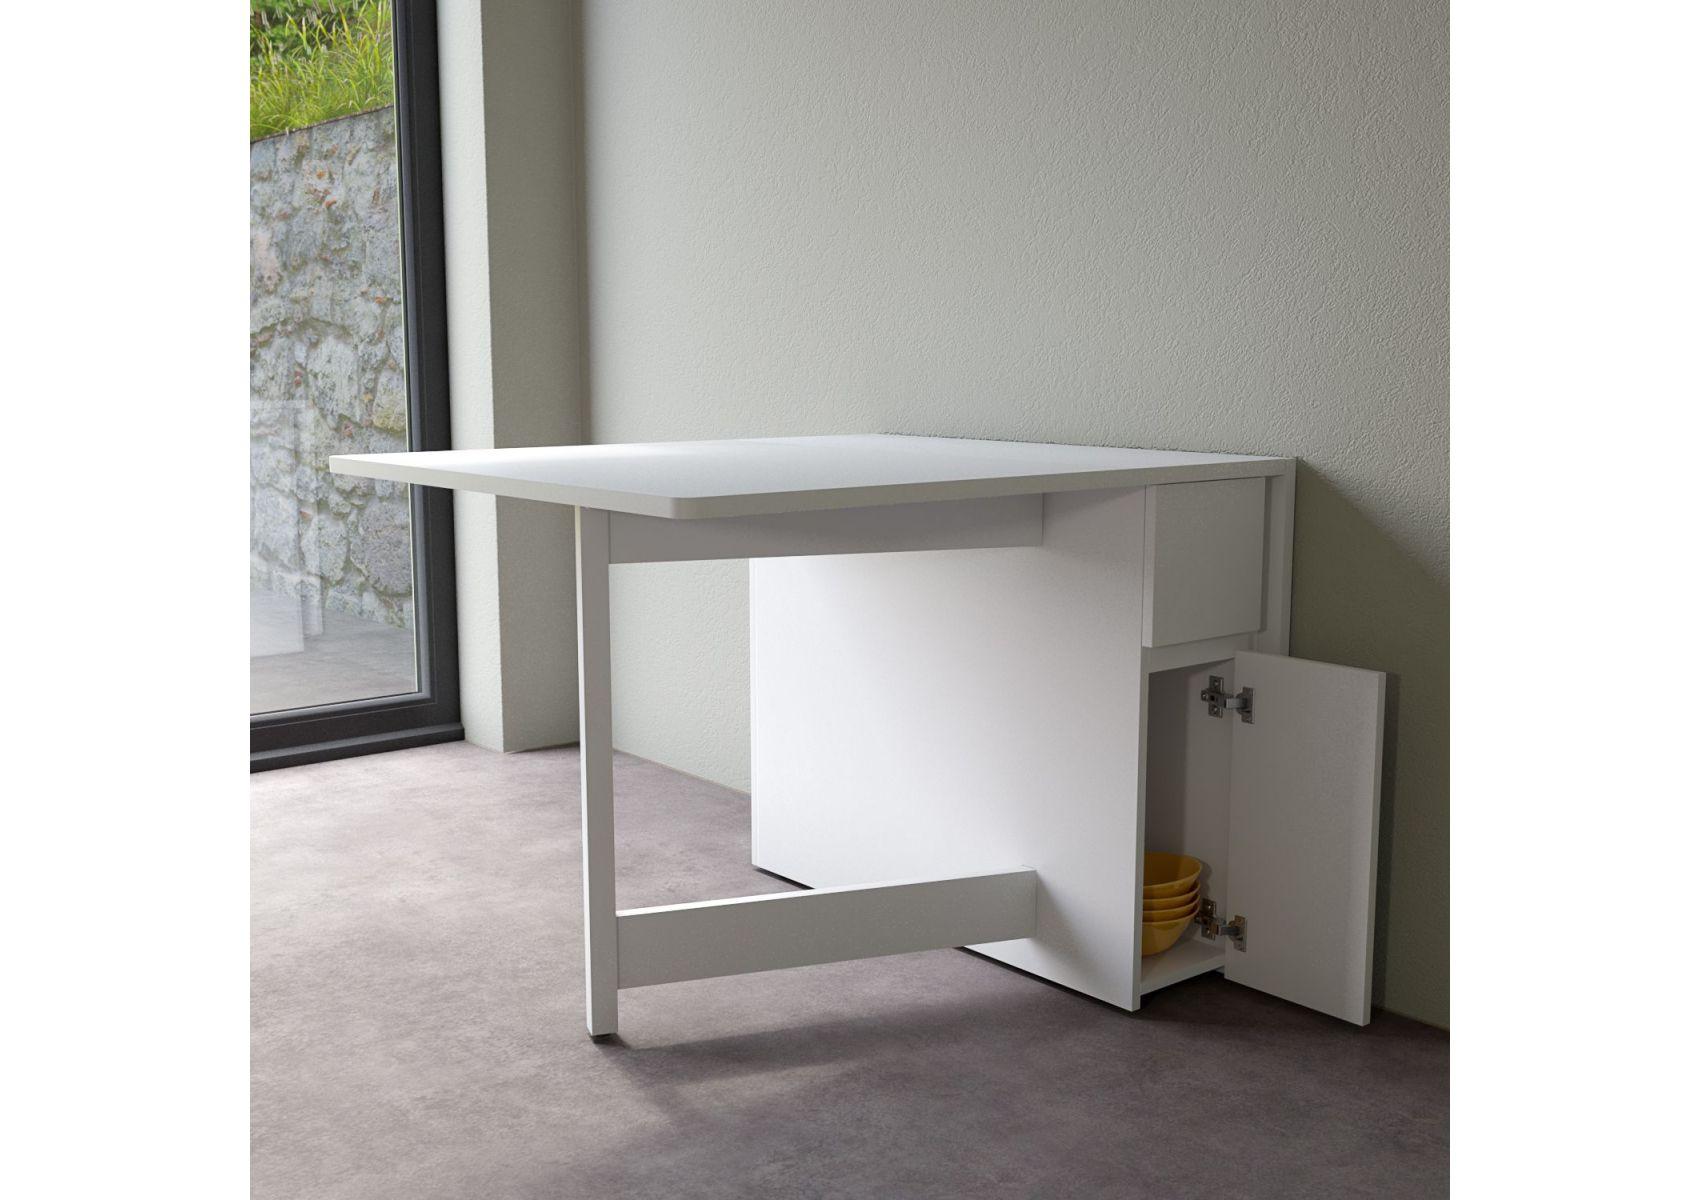 Table Console Pliante Kungla De Chez Woodman